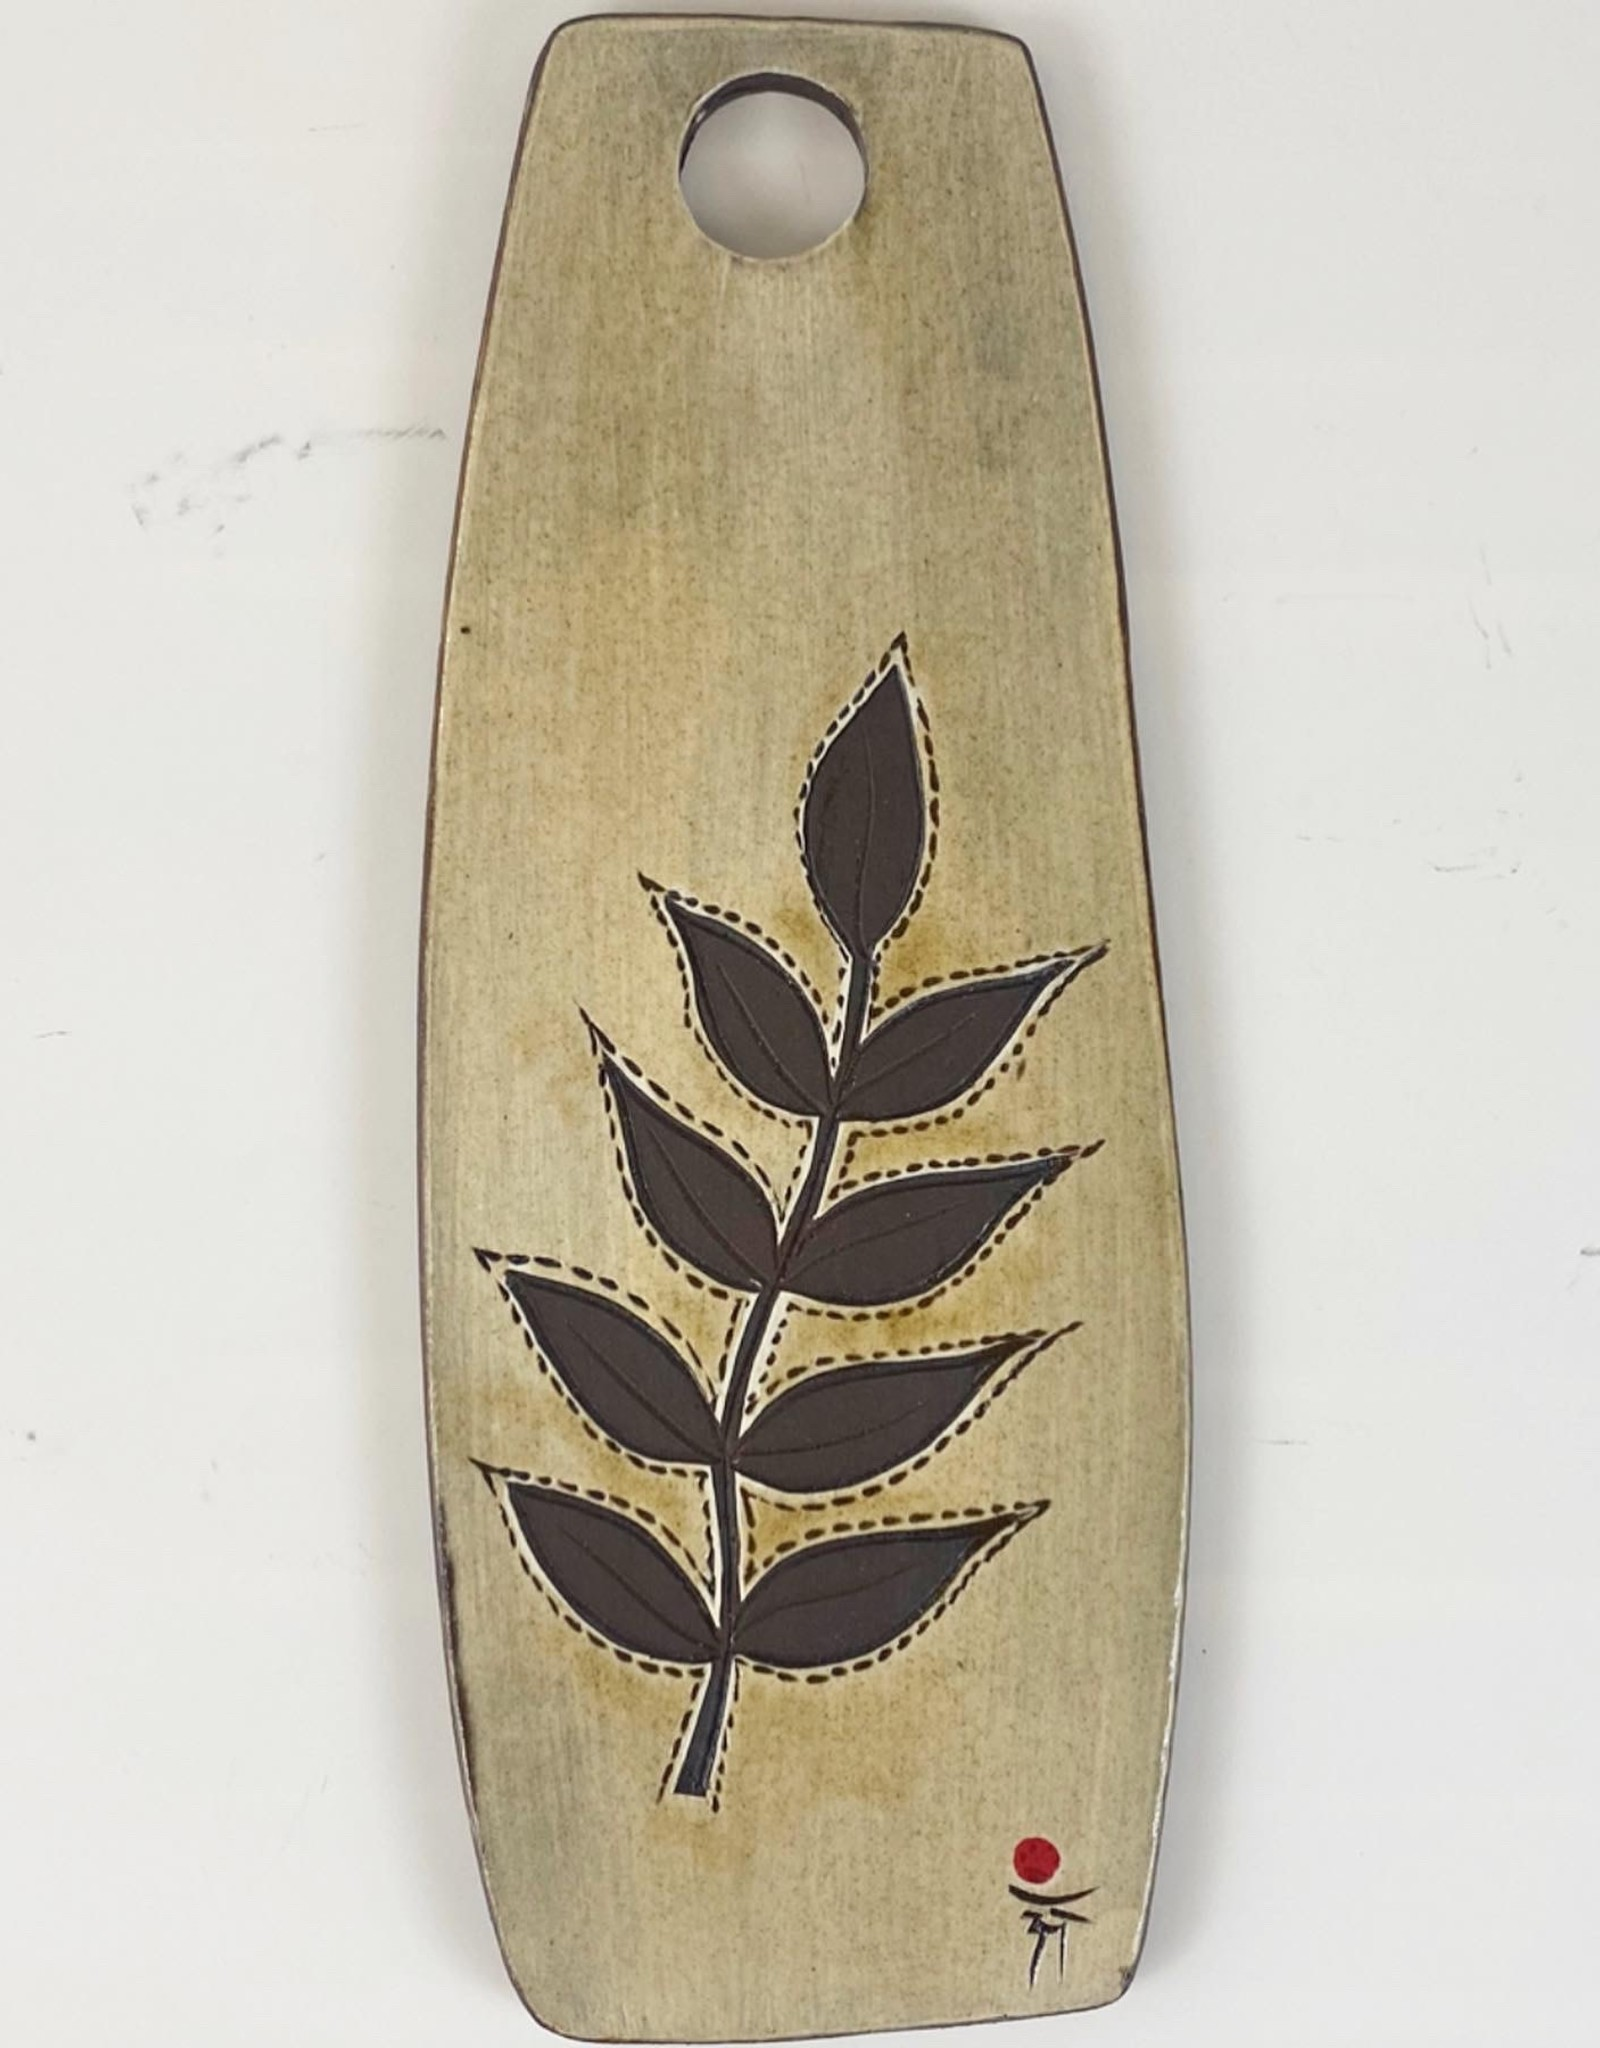 Anshula Tayal Amaati cheese board leaf (1)